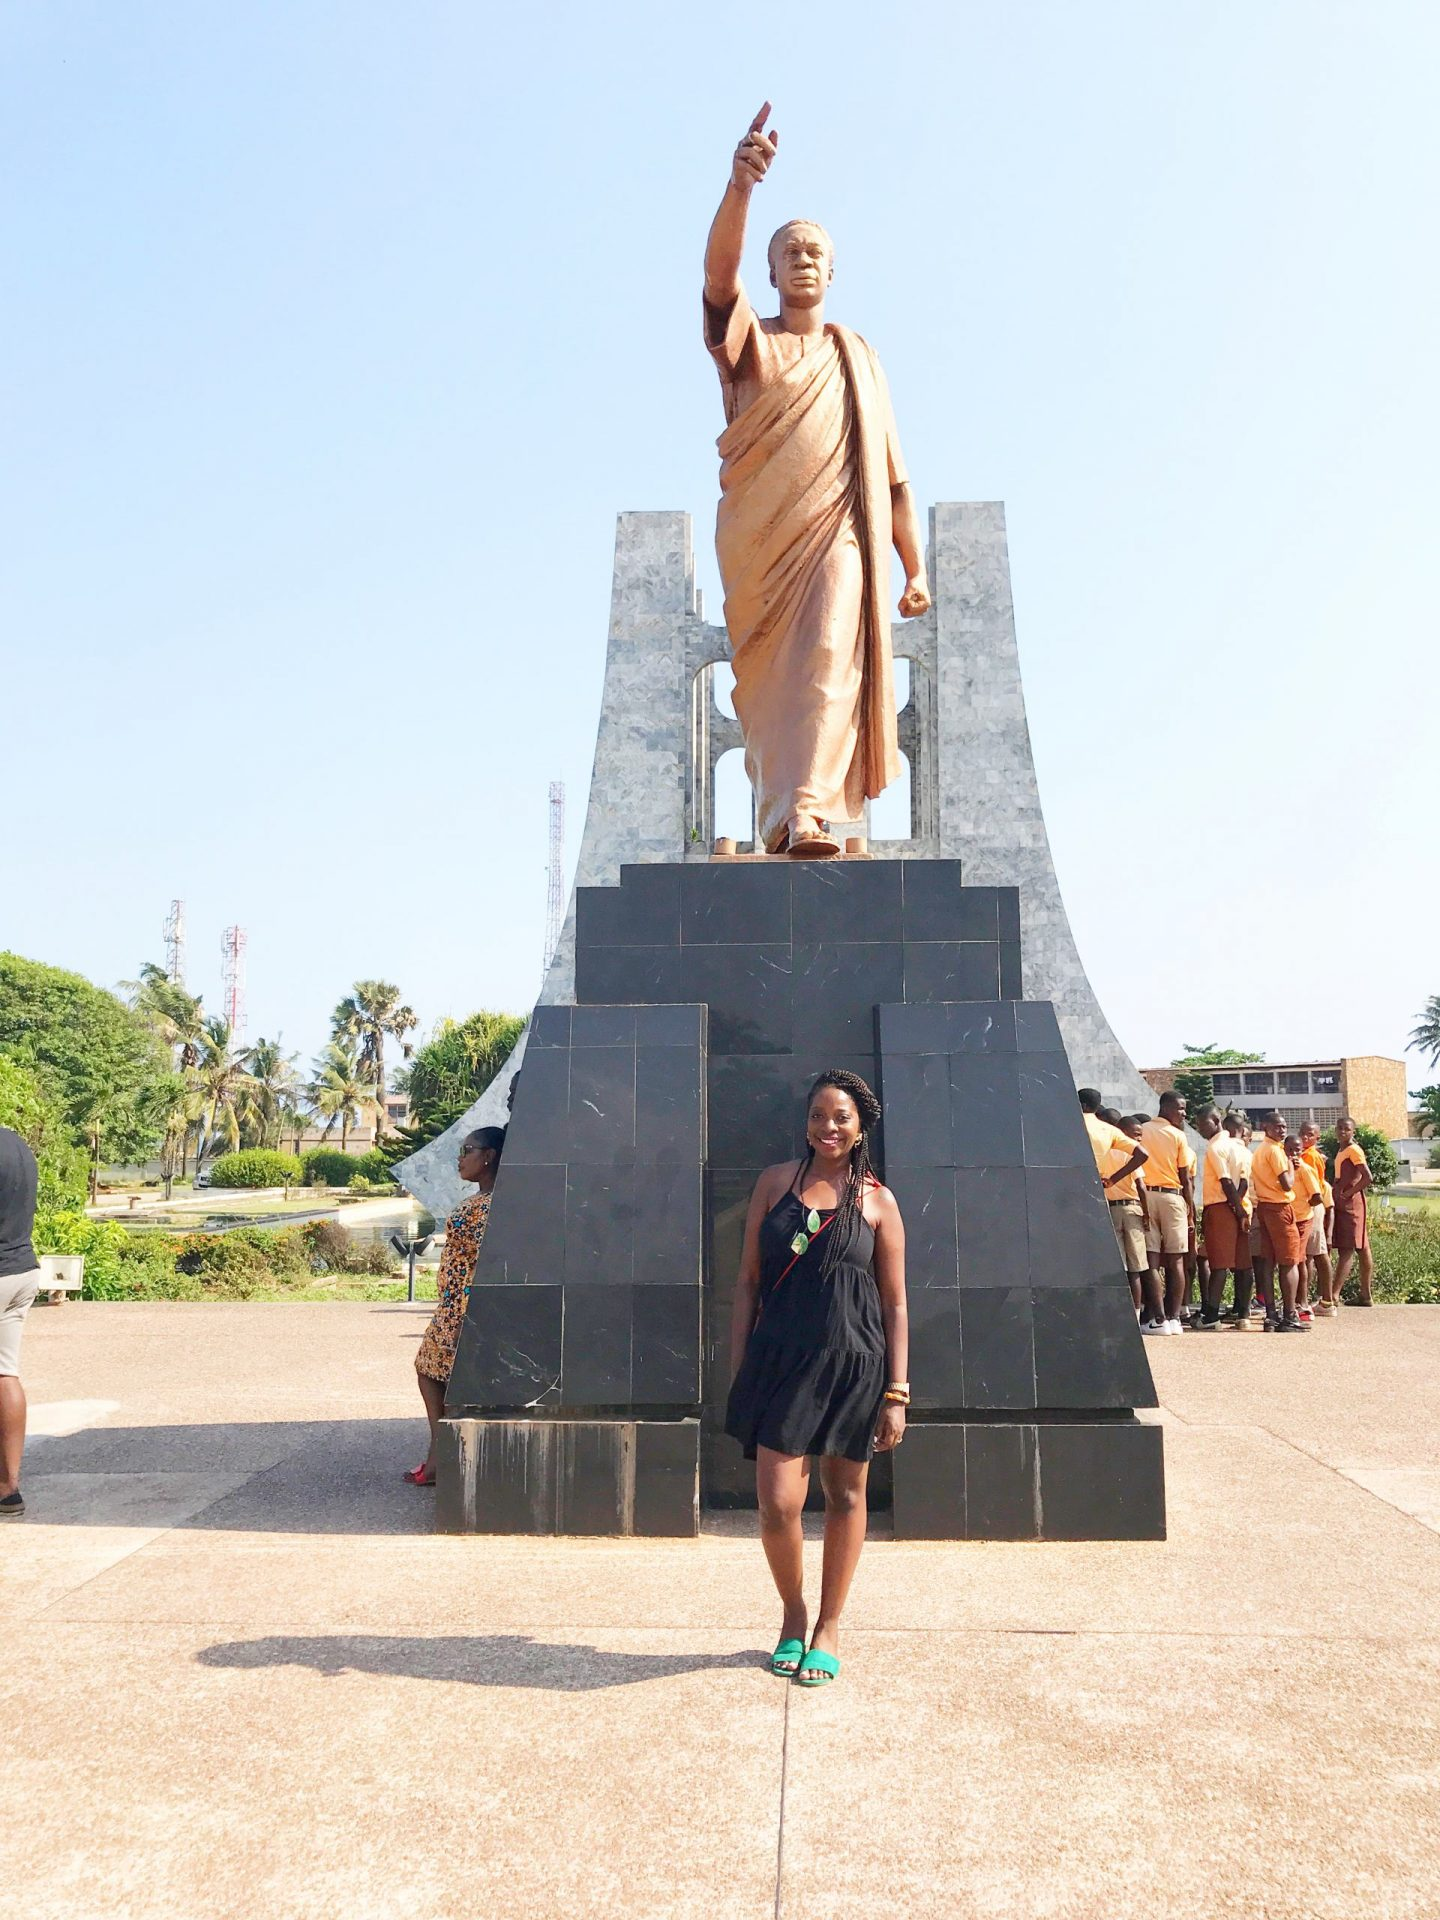 ghana in 10 days Kwame Nkrumah